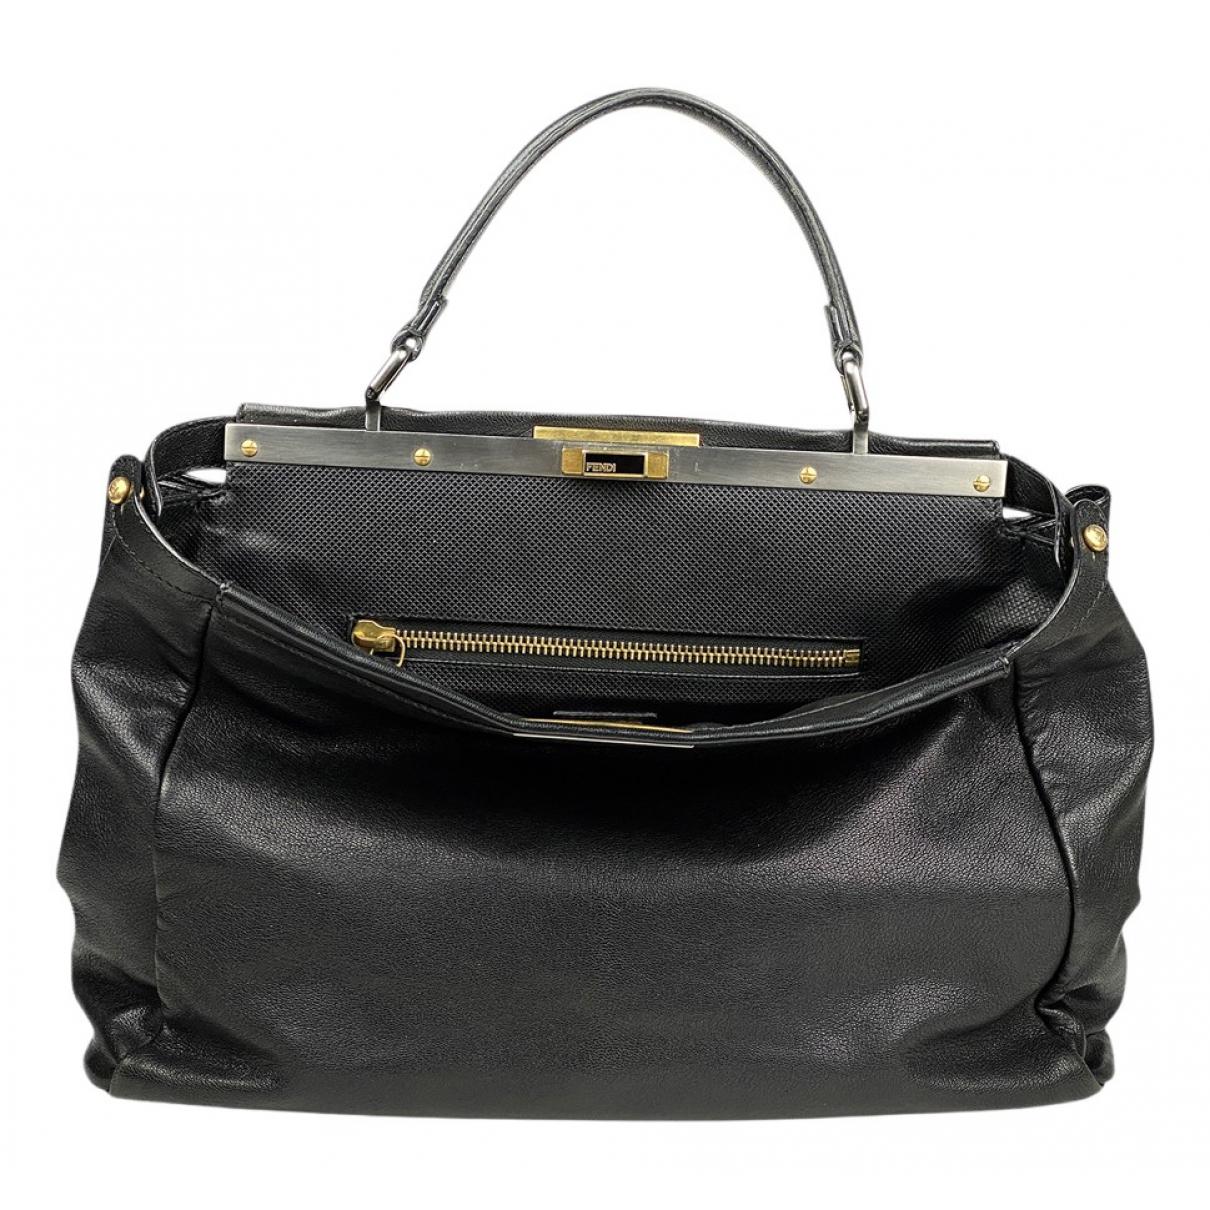 Fendi Peekaboo Black Leather handbag for Women \N